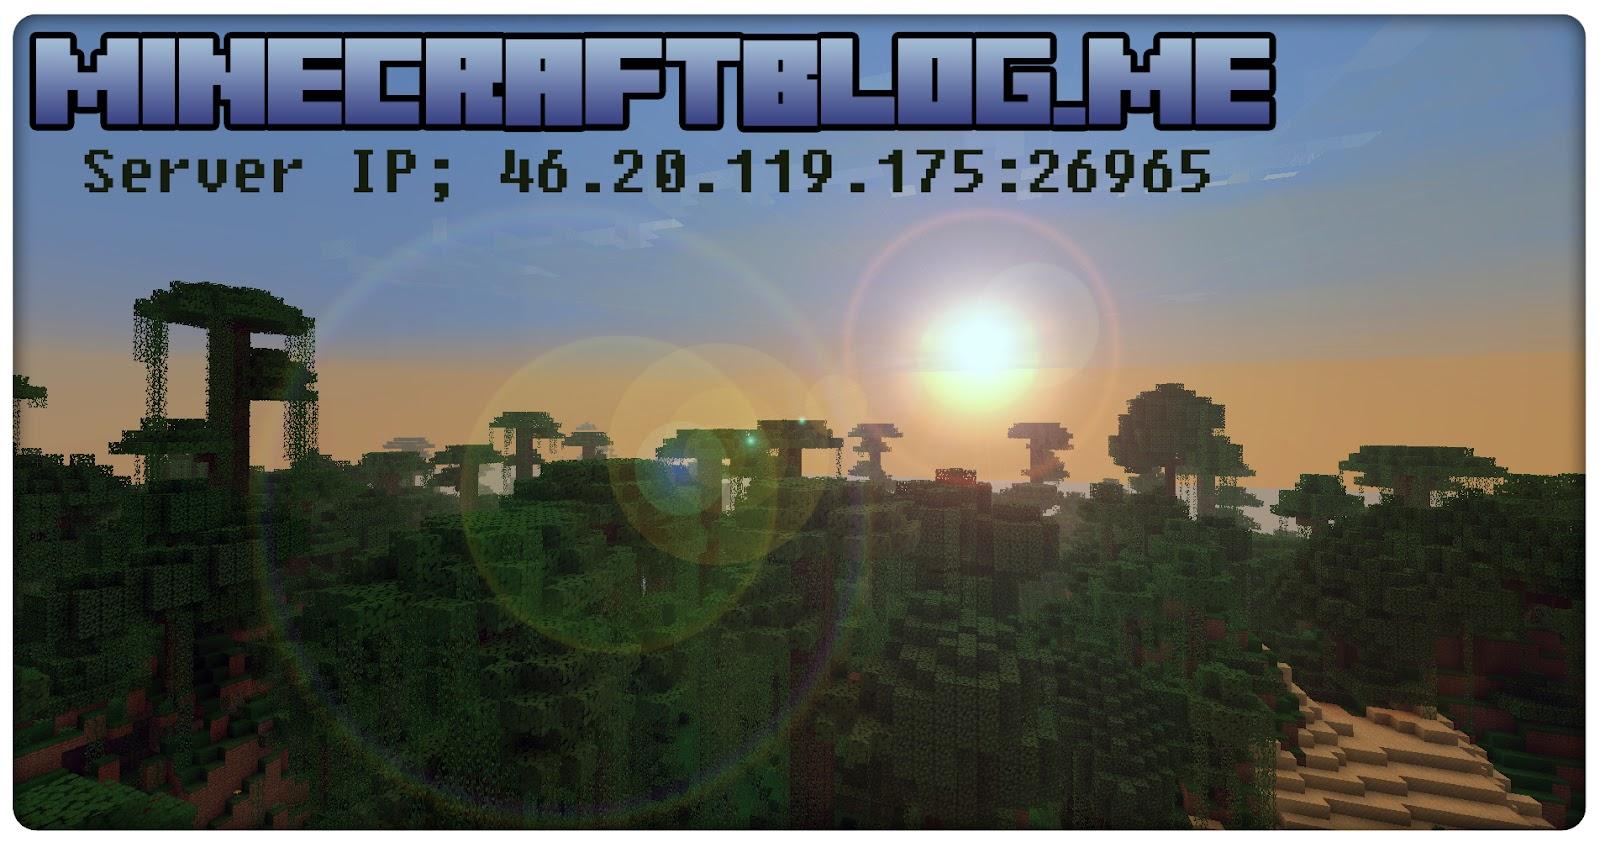 http://2.bp.blogspot.com/-XGTR_P58cZQ/T5c6CDf7g1I/AAAAAAAABKQ/tKgcrSx39BY/s1600/minecraft_blog_server.jpg